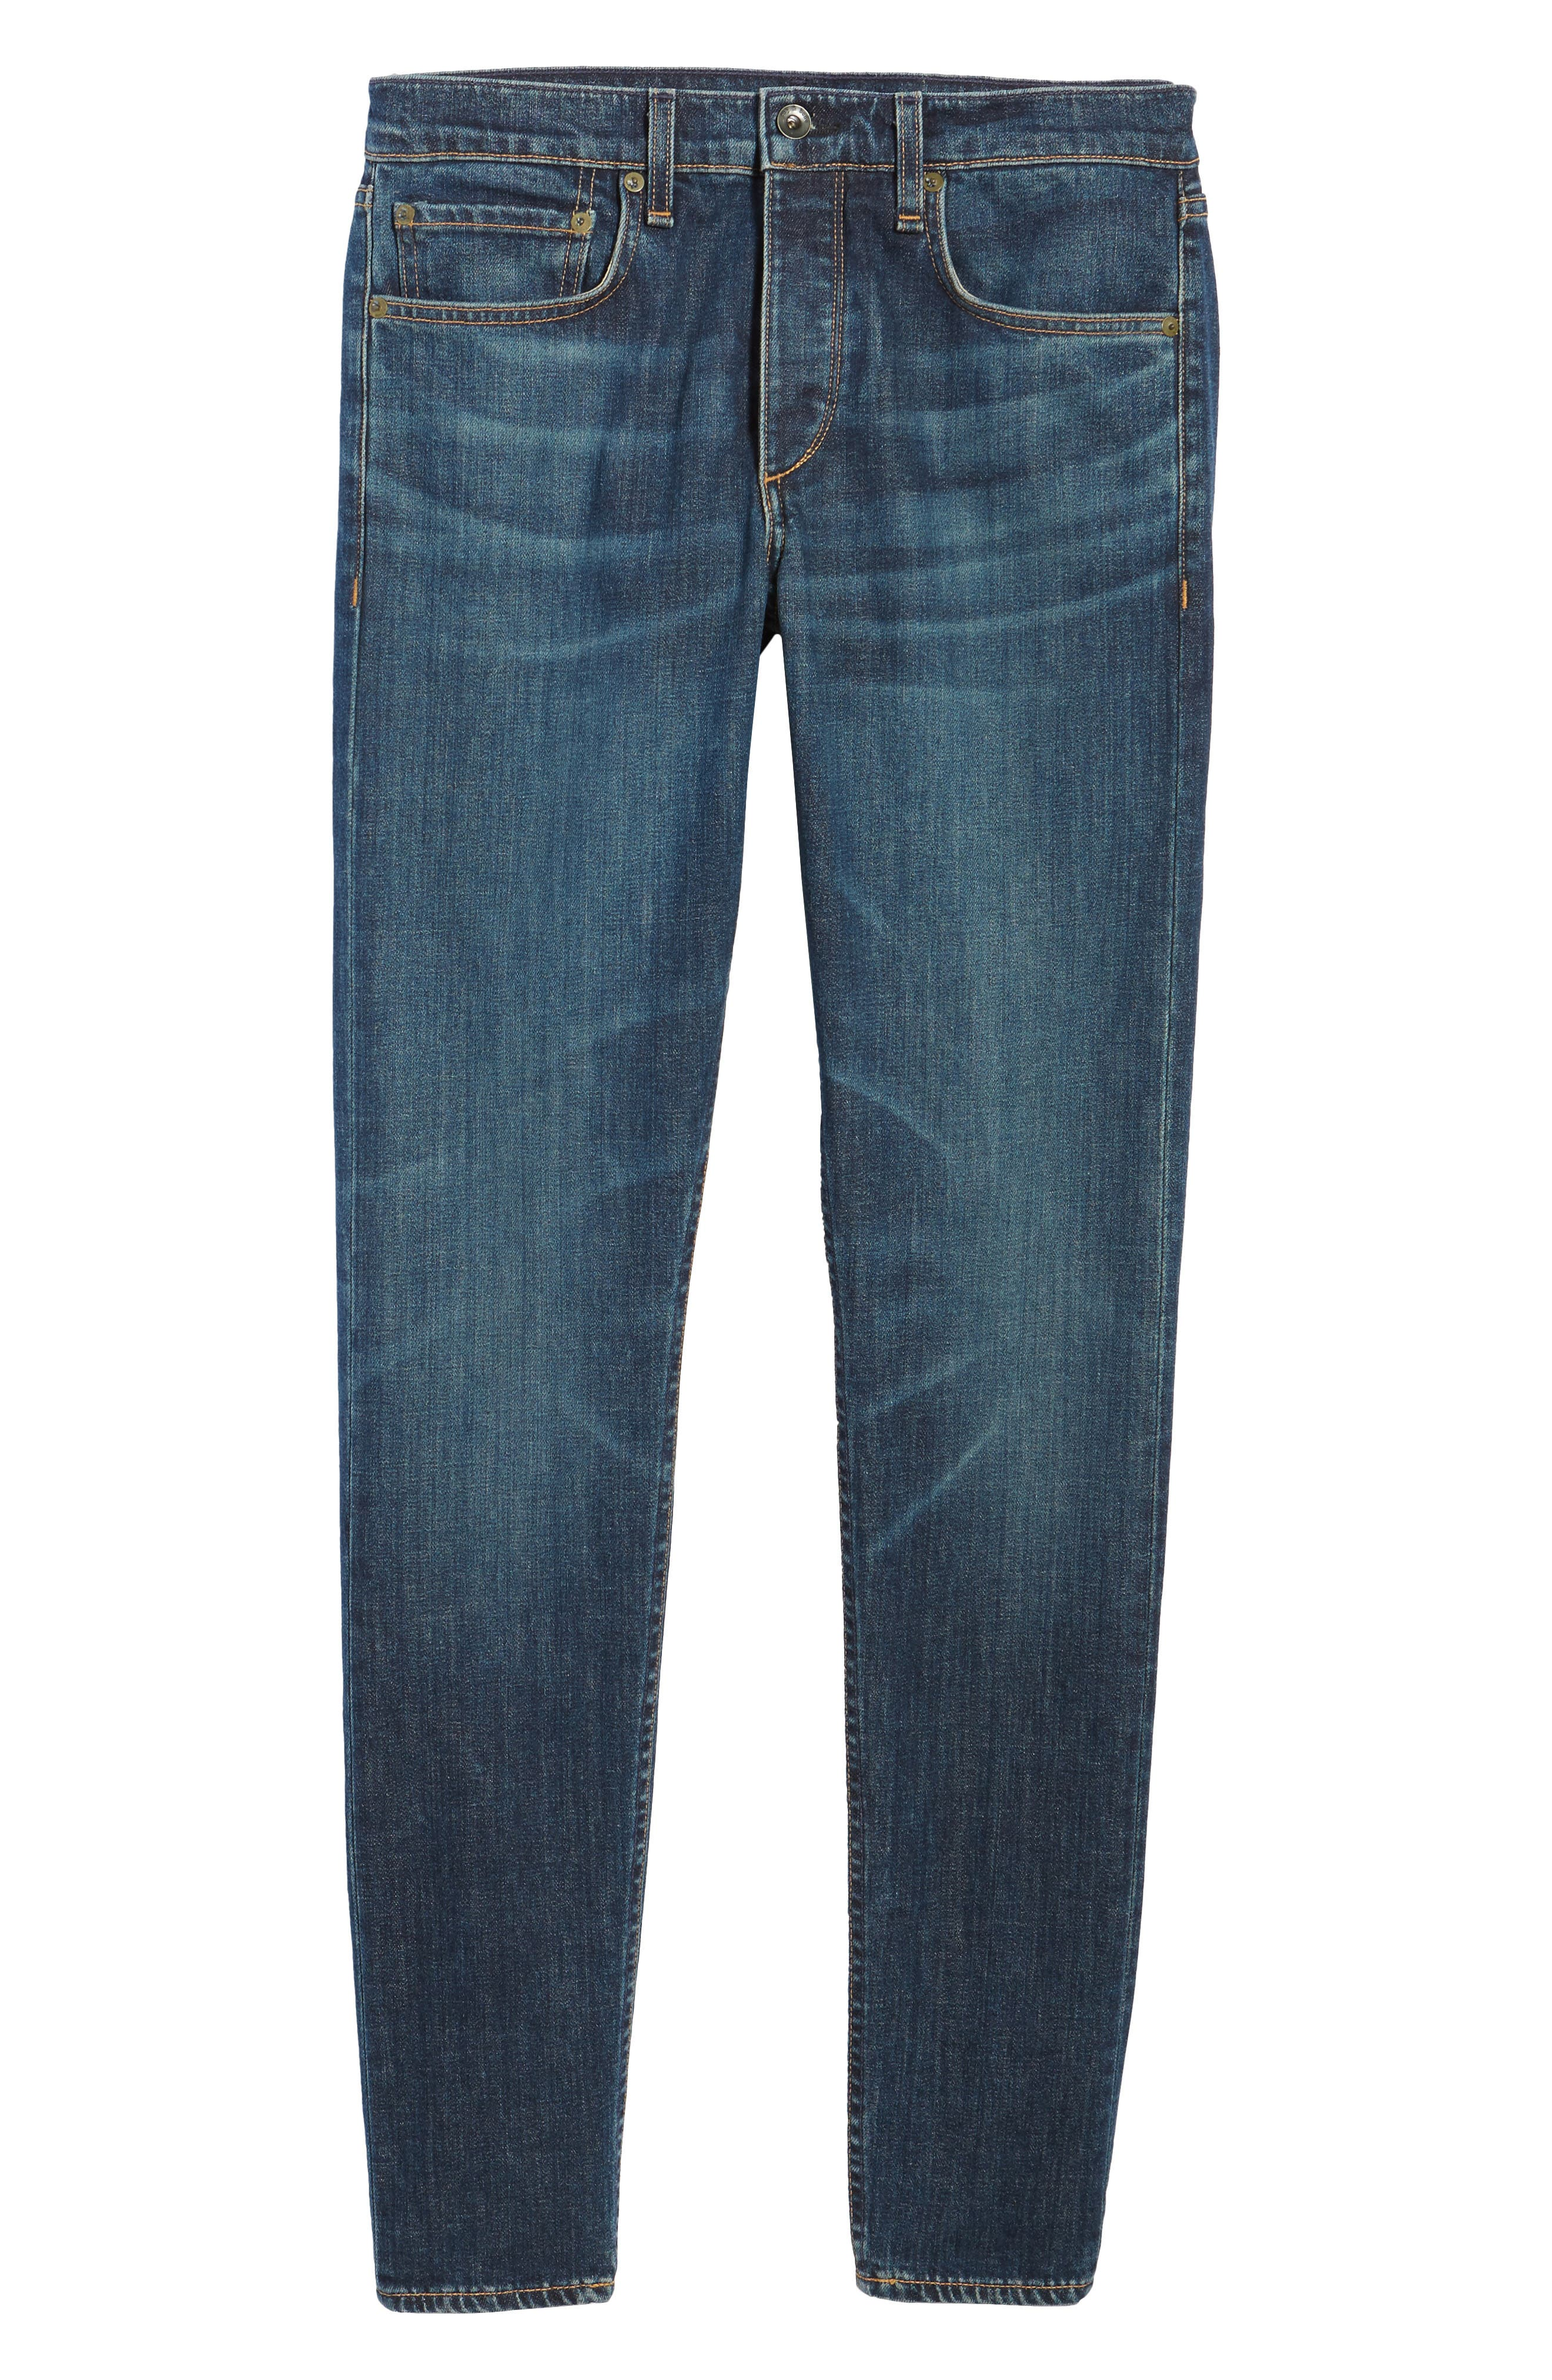 RAG & BONE,                             Fit 1 Skinny Fit Jeans,                             Alternate thumbnail 6, color,                             420